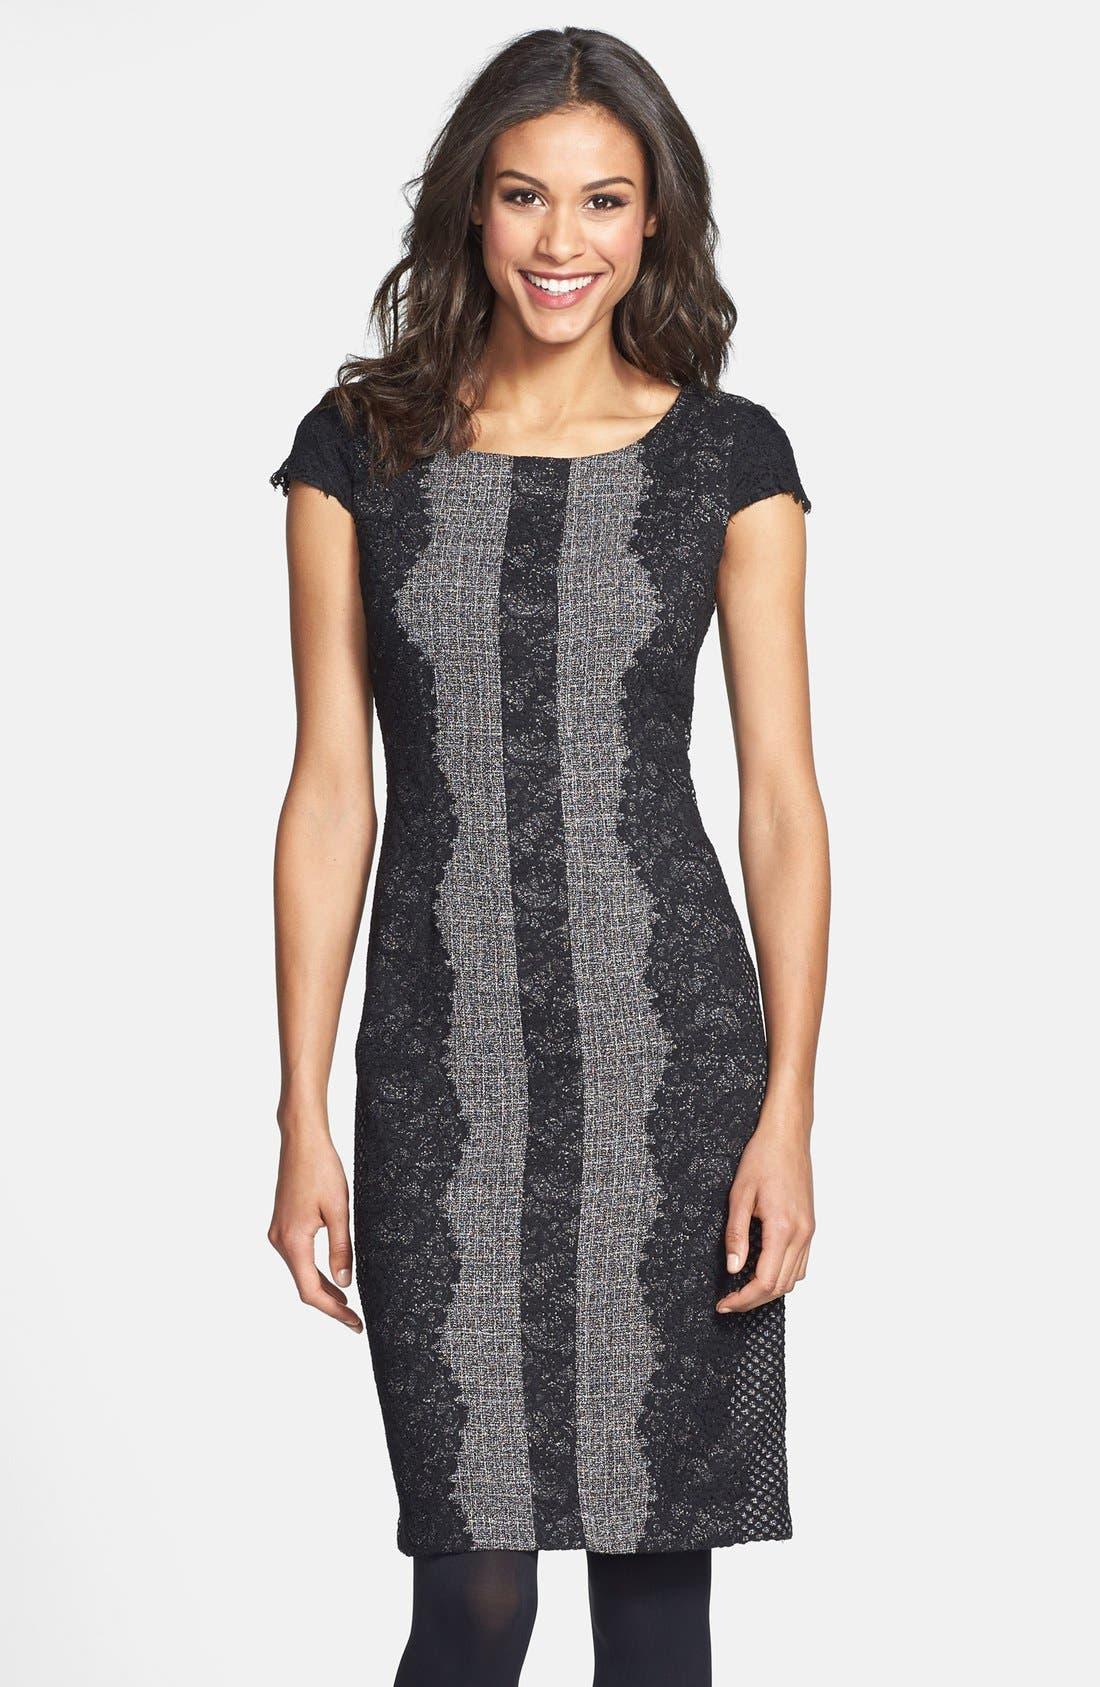 Alternate Image 1 Selected - Betsey Johnson Lace Trim Tweed Sheath Dress